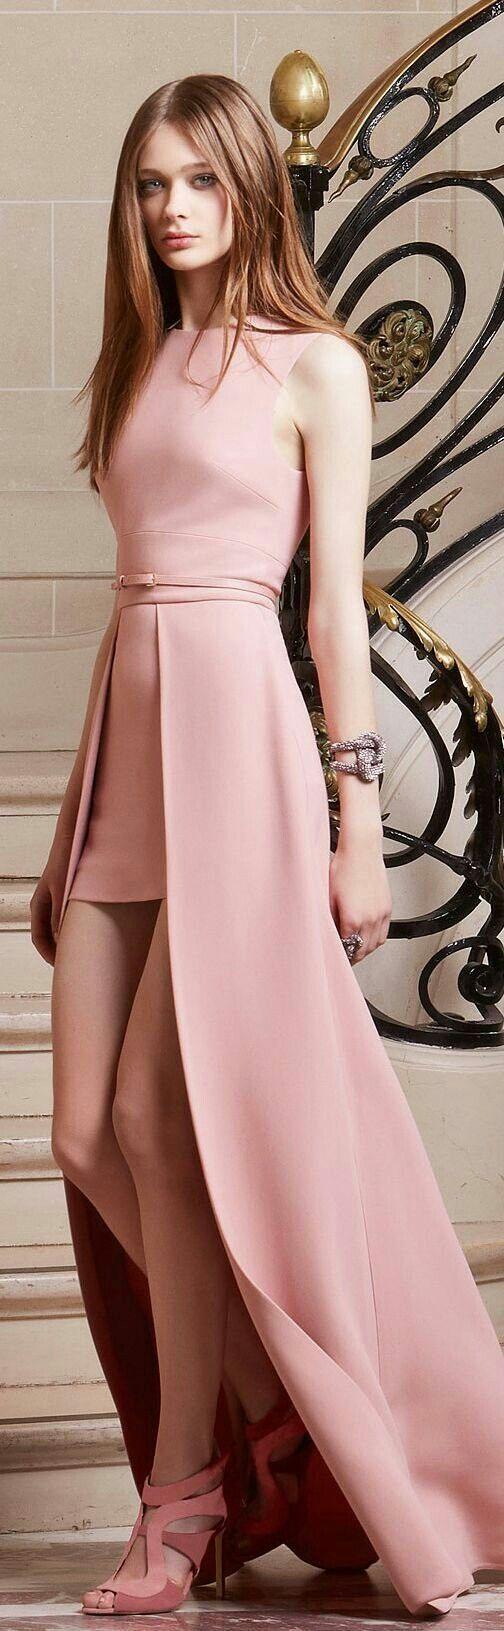 Mejores 64 imágenes de fashion en Pinterest | Moda para damas, Ropa ...